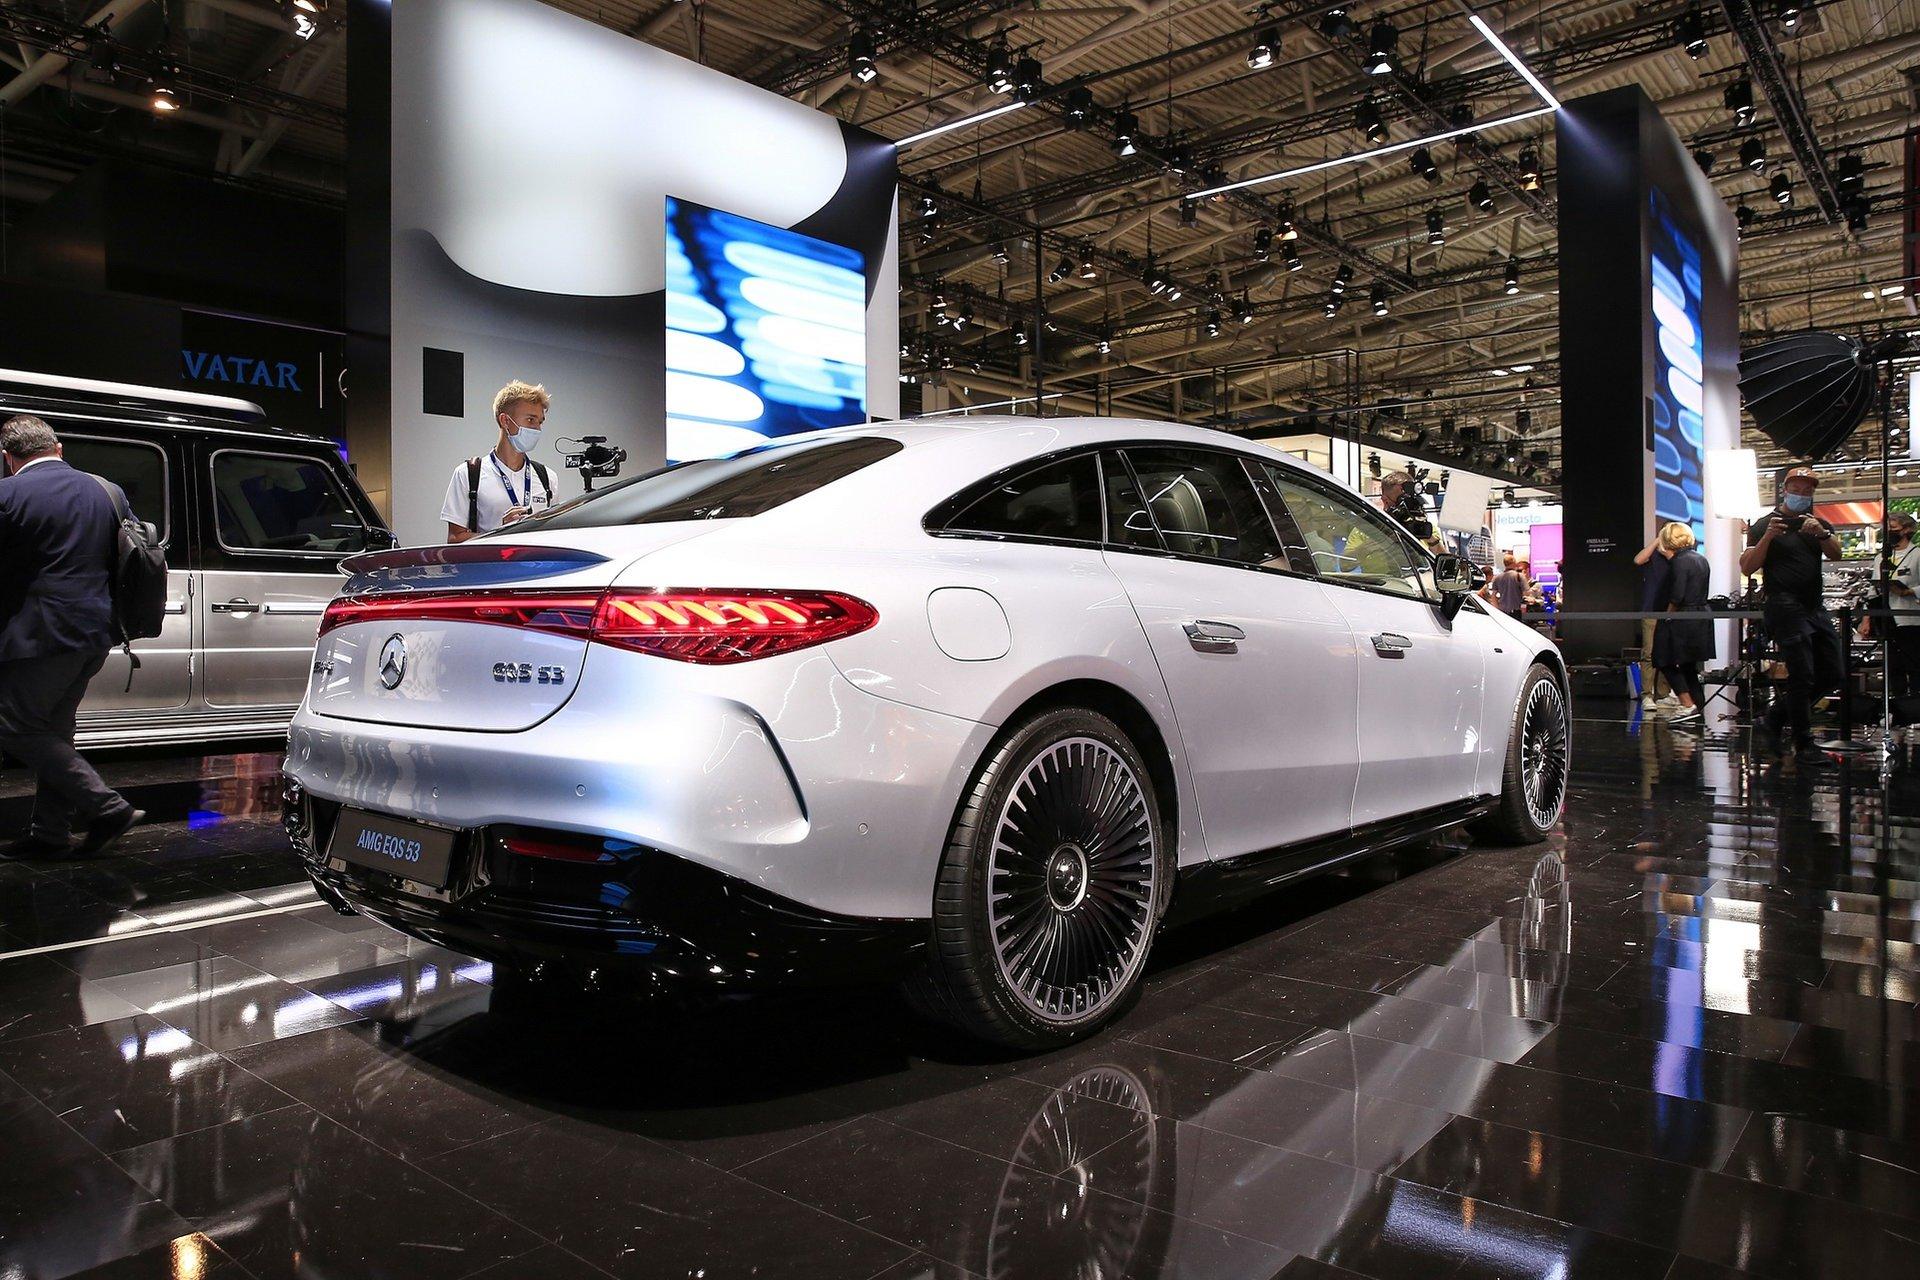 2023-Mercedes-EQS-53-AMG-7.jpg